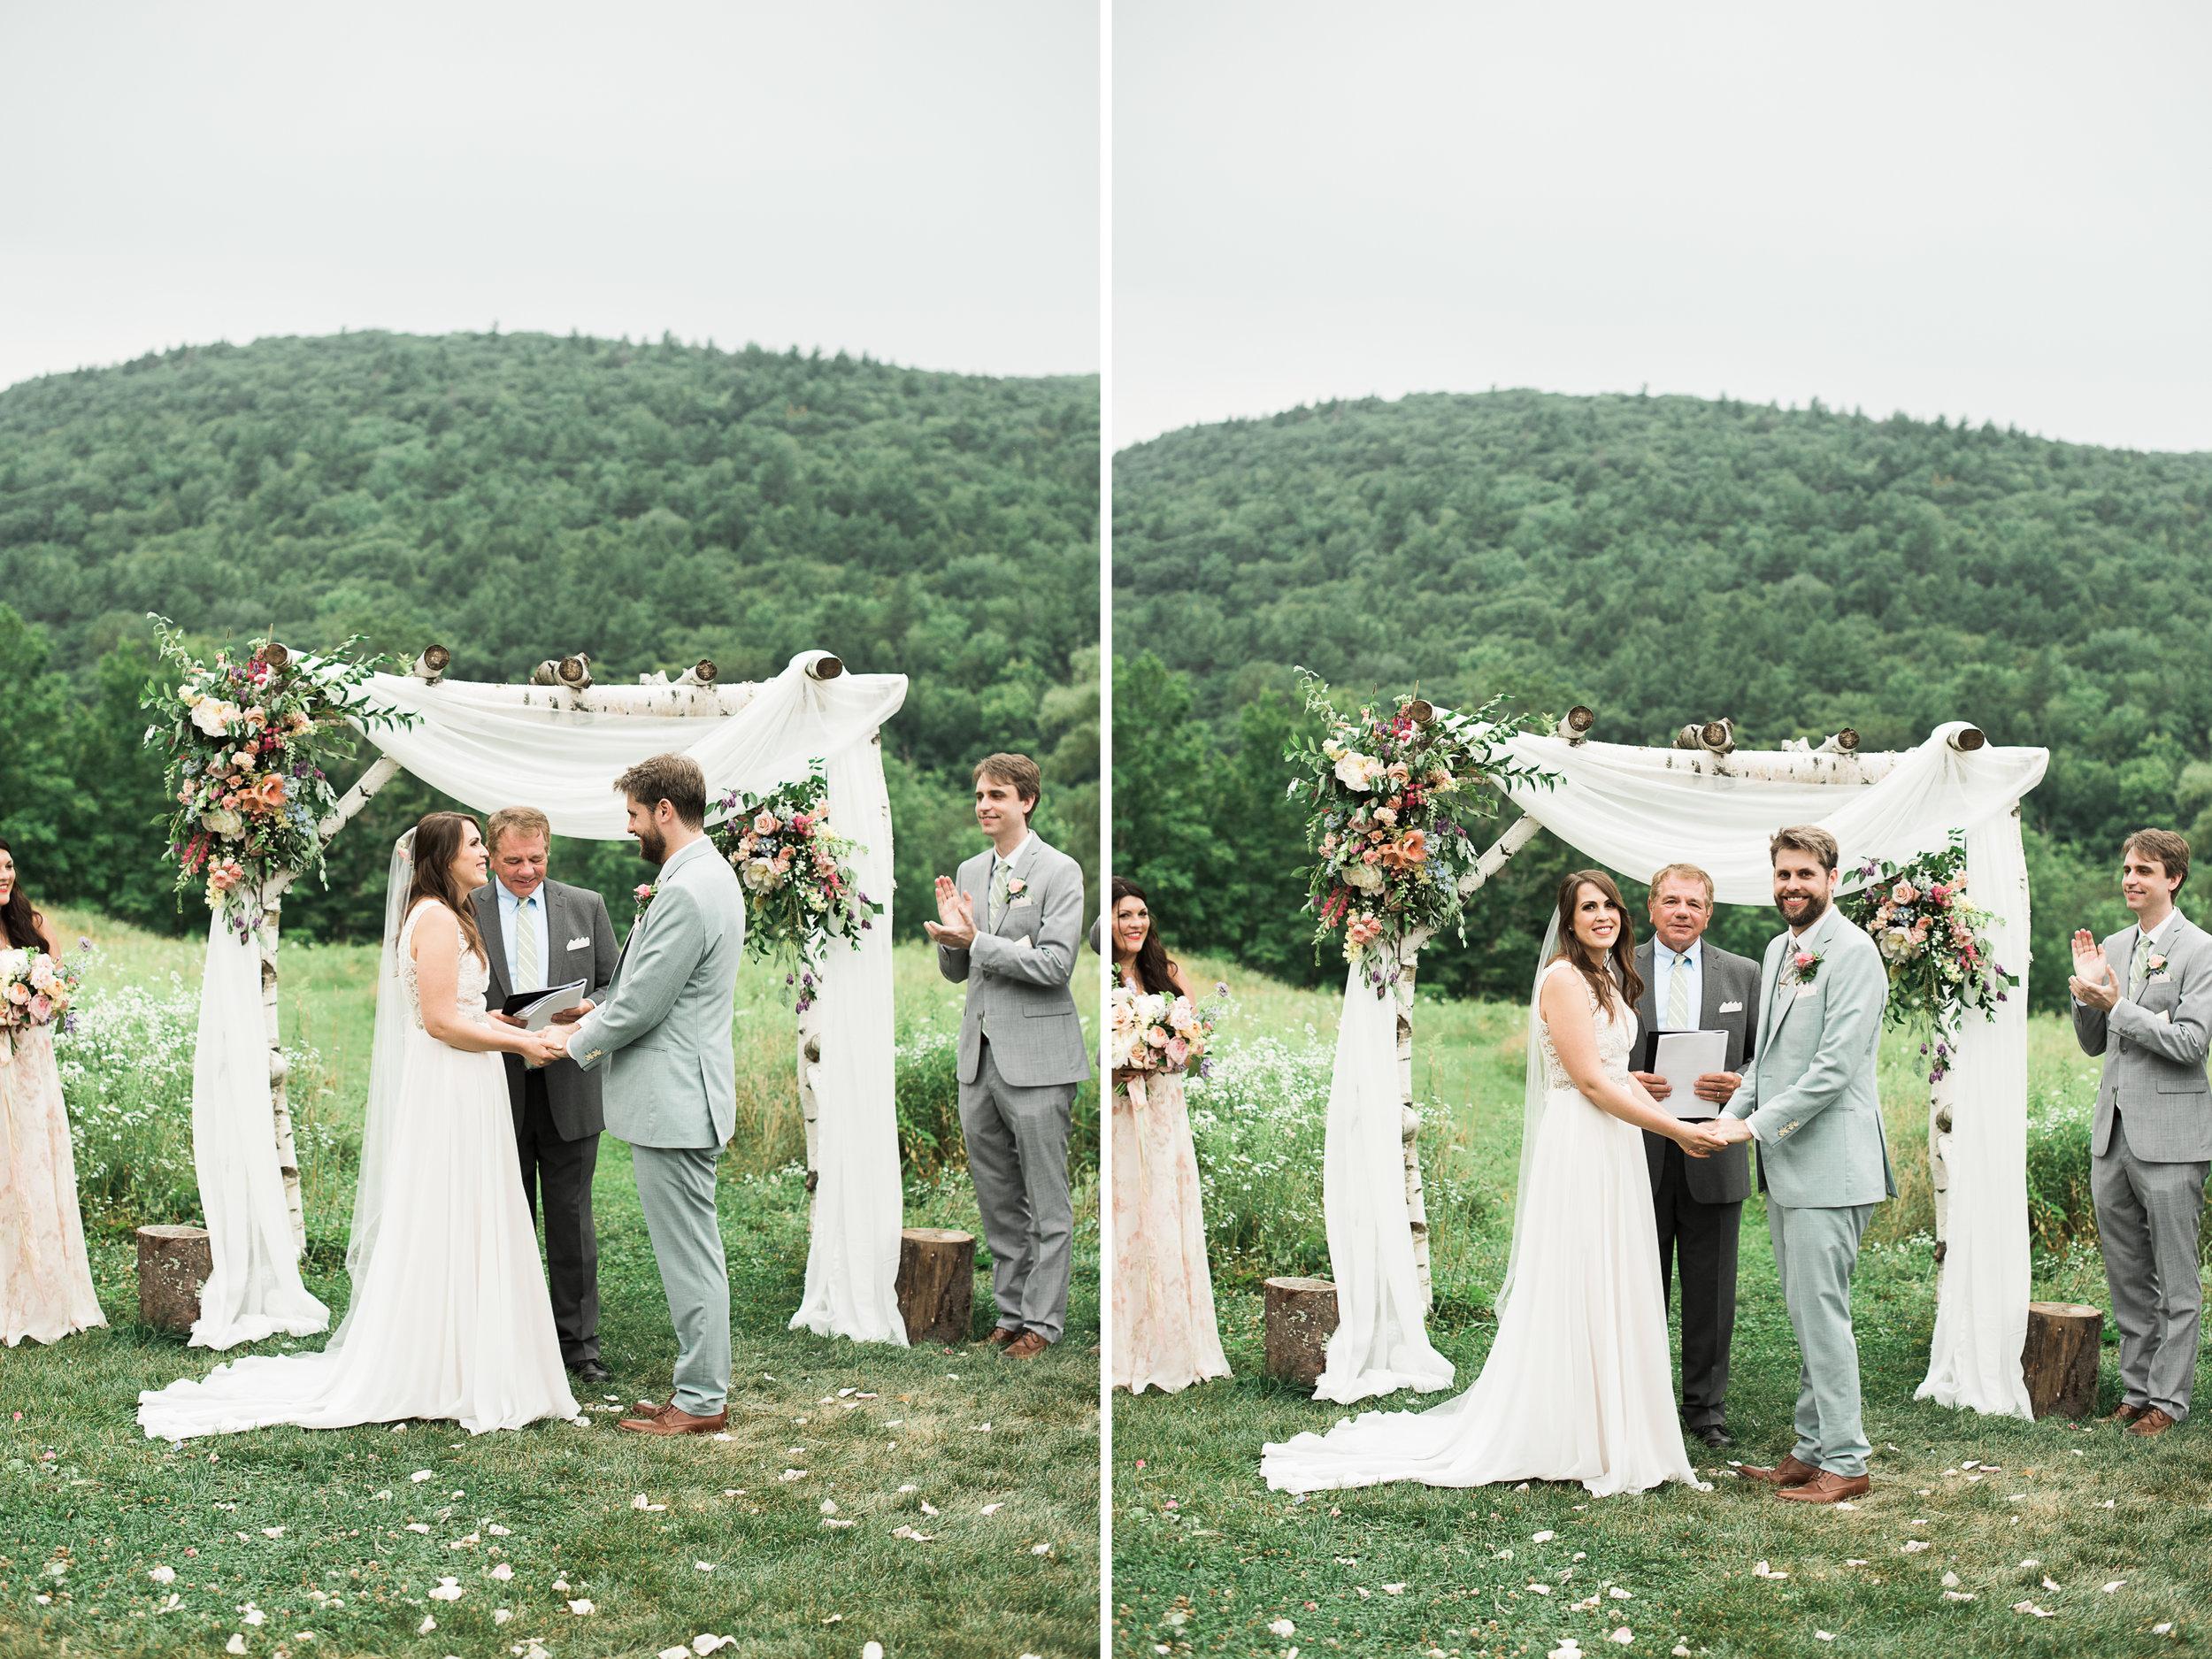 Fine art wedding photography